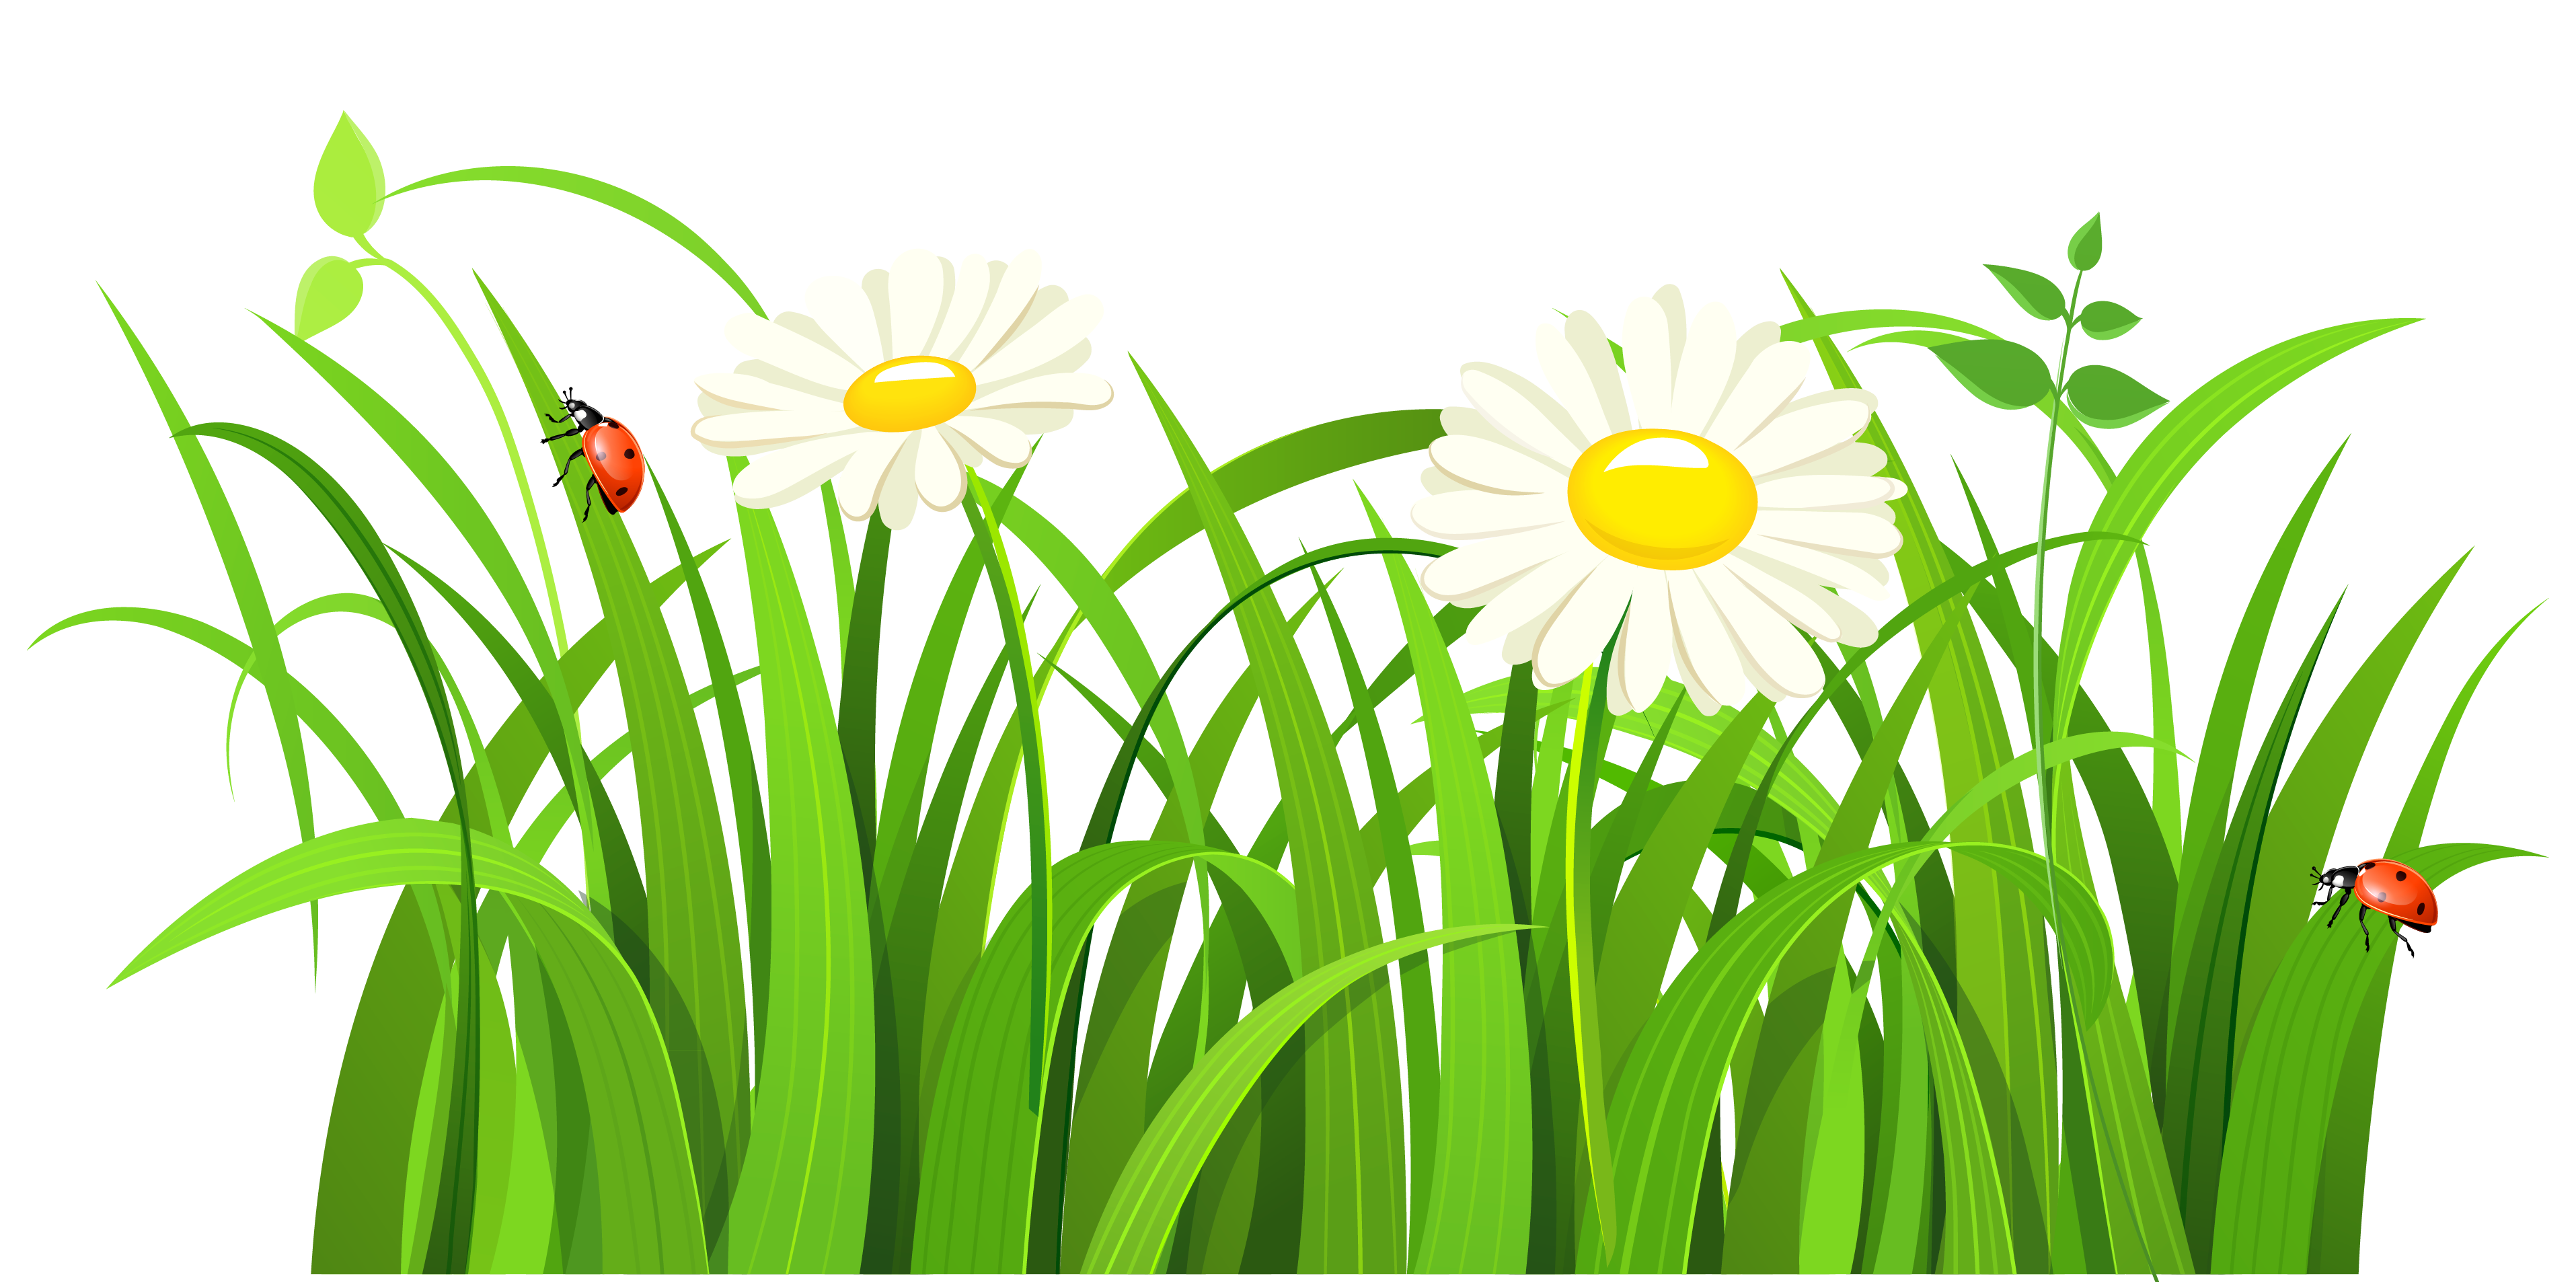 Grass clipart clipartcow